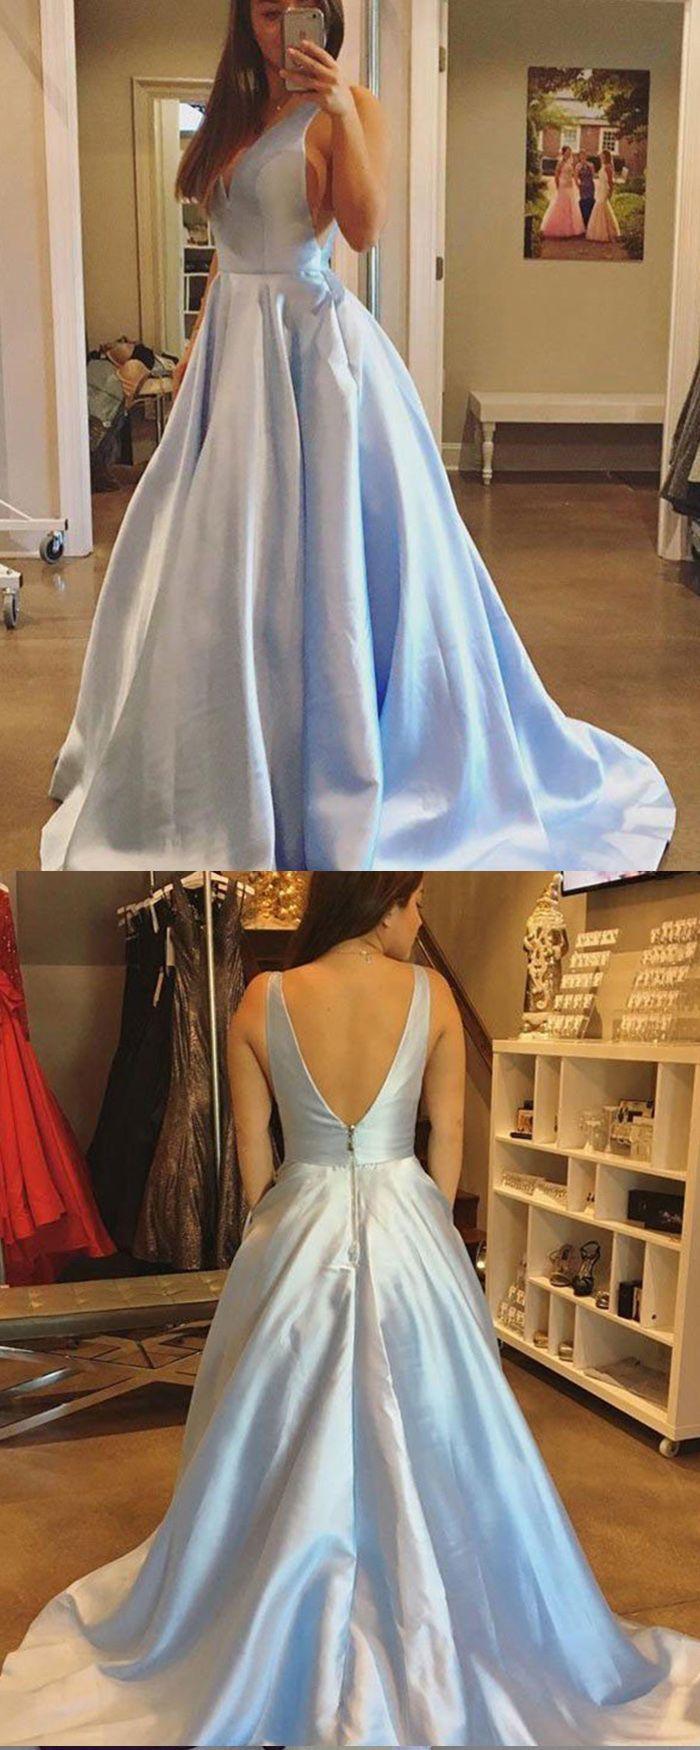 Simple vneck light blue satin ball gown prom dress pm long